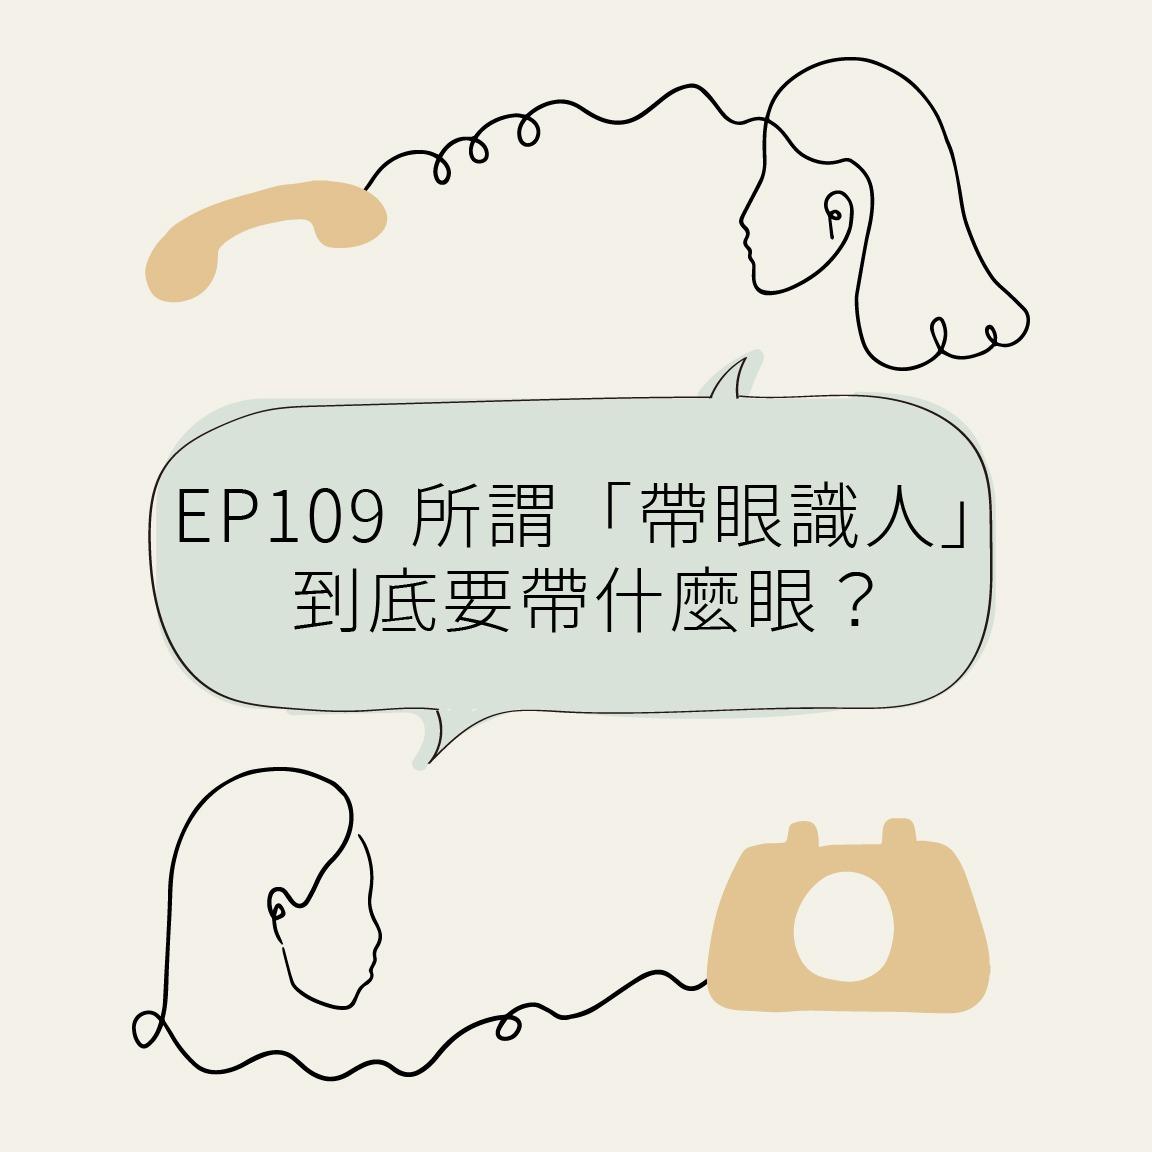 "EP109 所谓""带眼识人"",到底要带什么眼?"